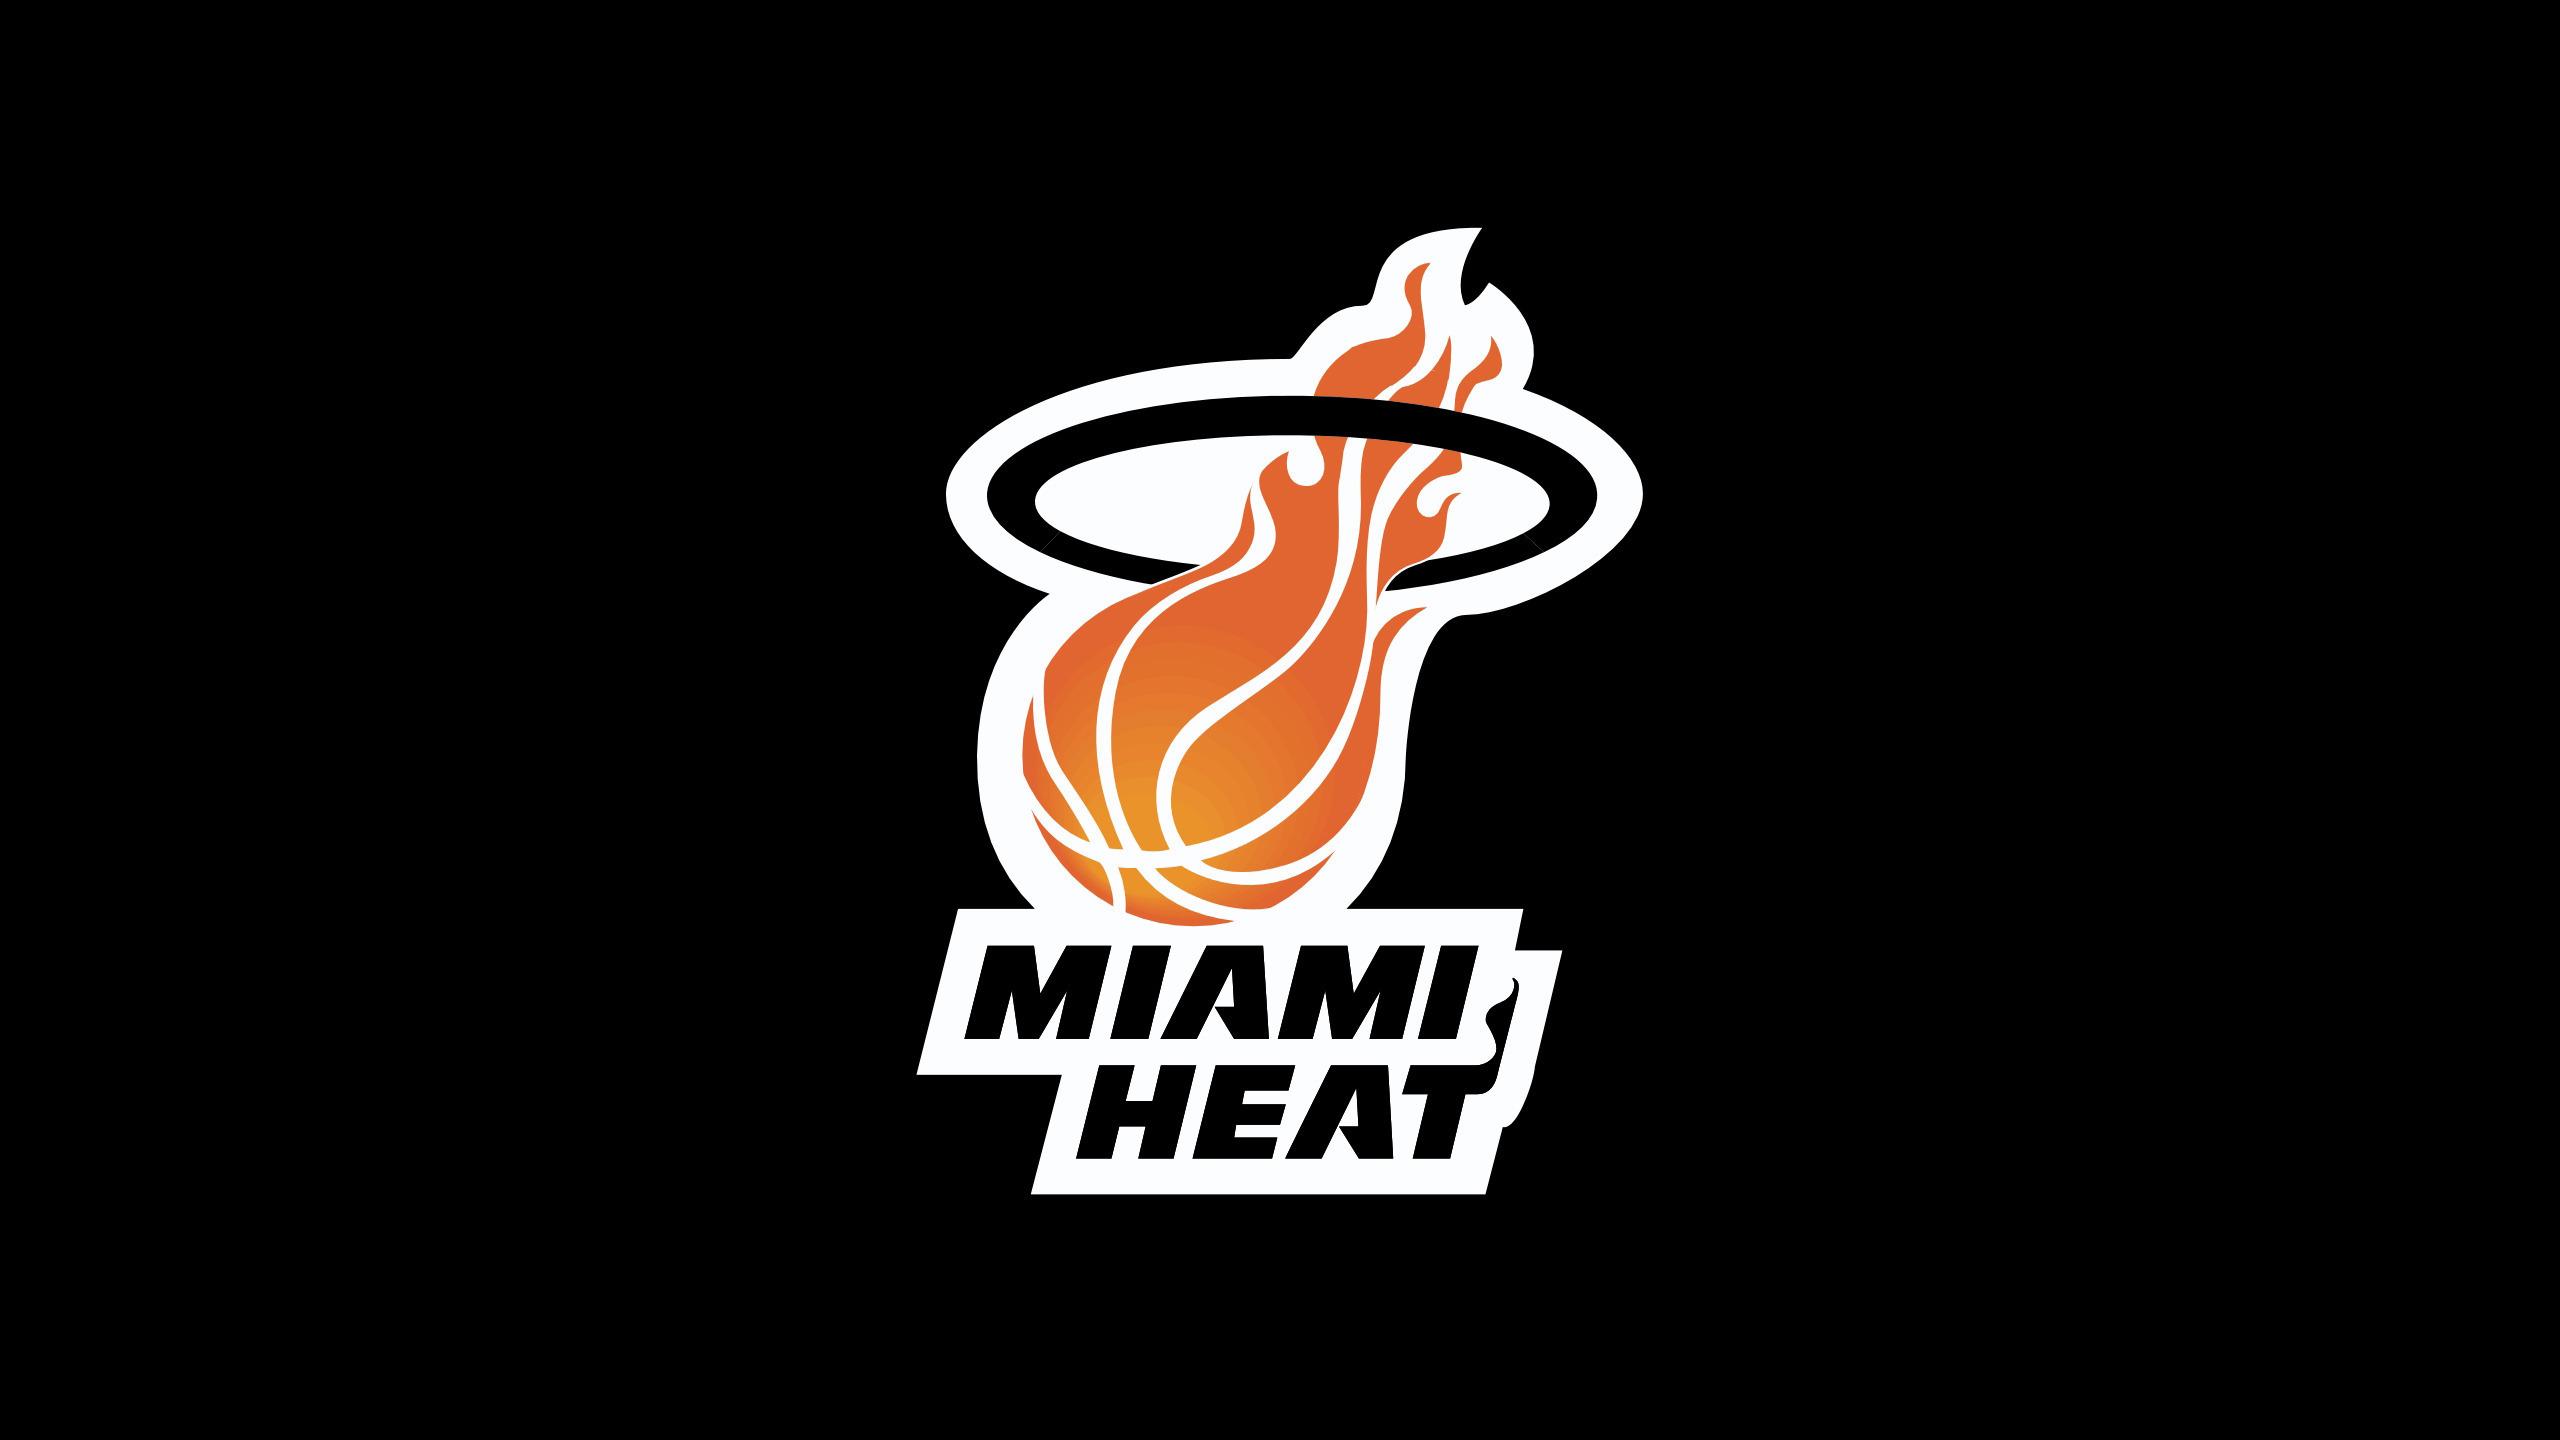 Lakers 3d Logo Wallpaper Logo Miami Heat Wallpapers Pixelstalk Net